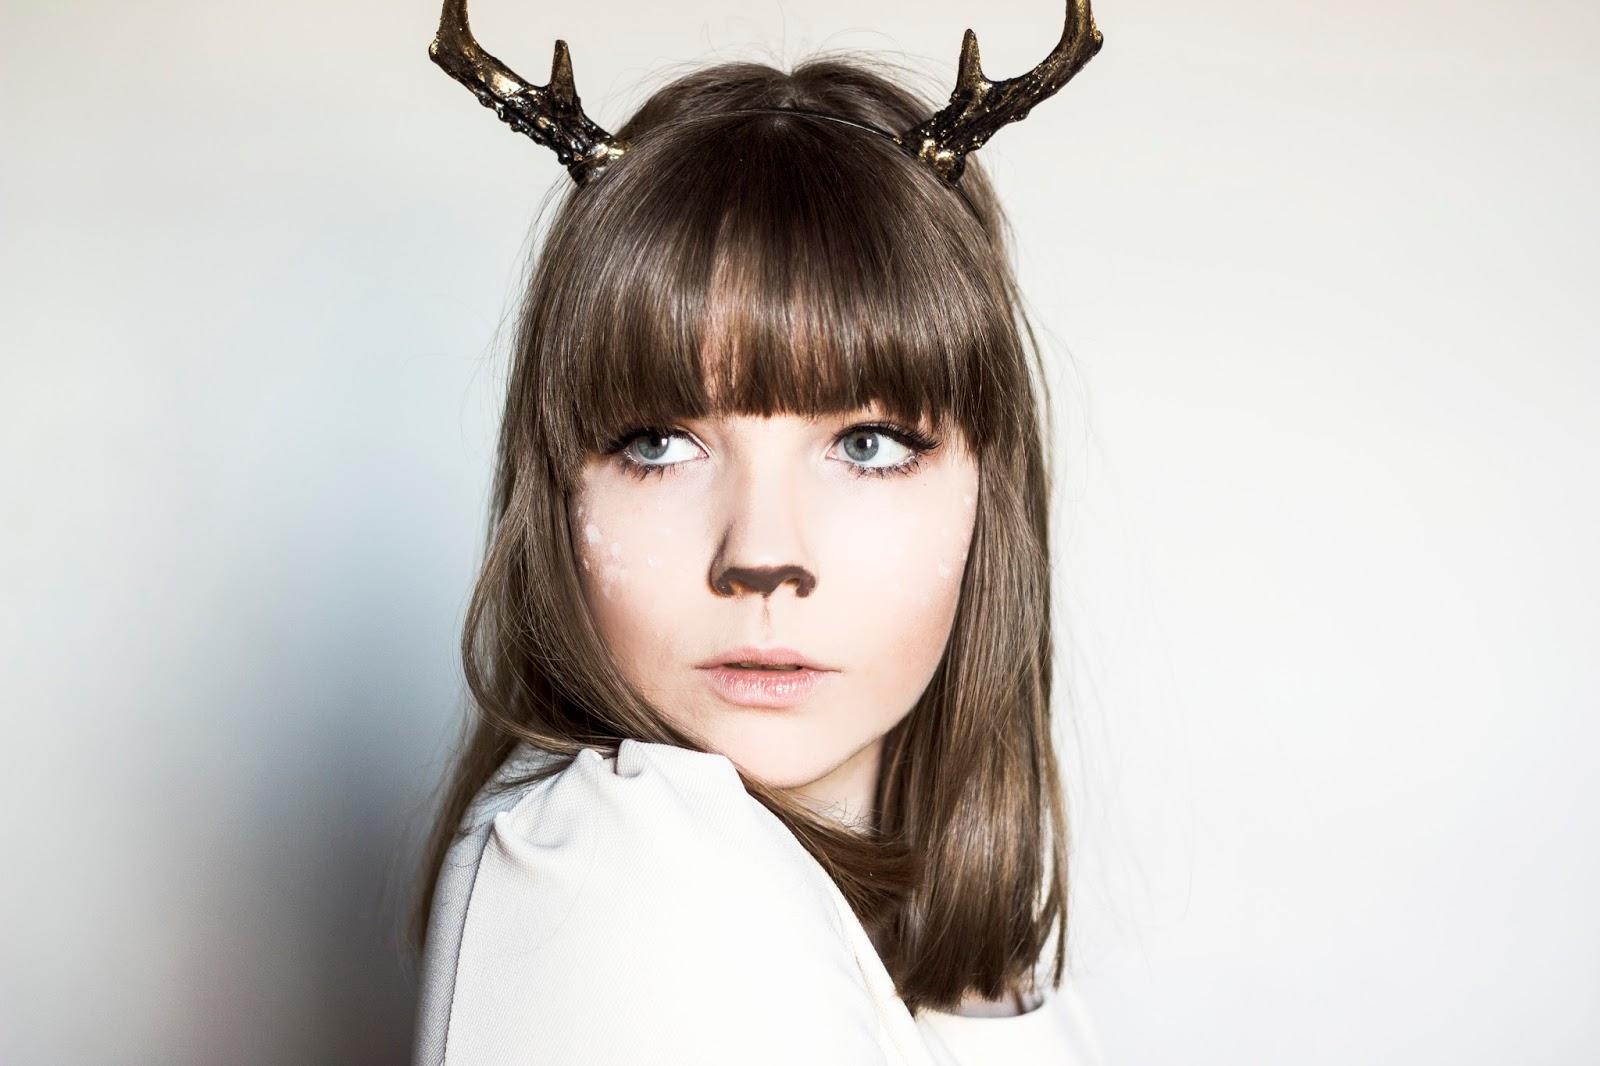 http://www.thewhimsicalwildling.com/2017/01/reindeer-makeup-tutorial-cf.html